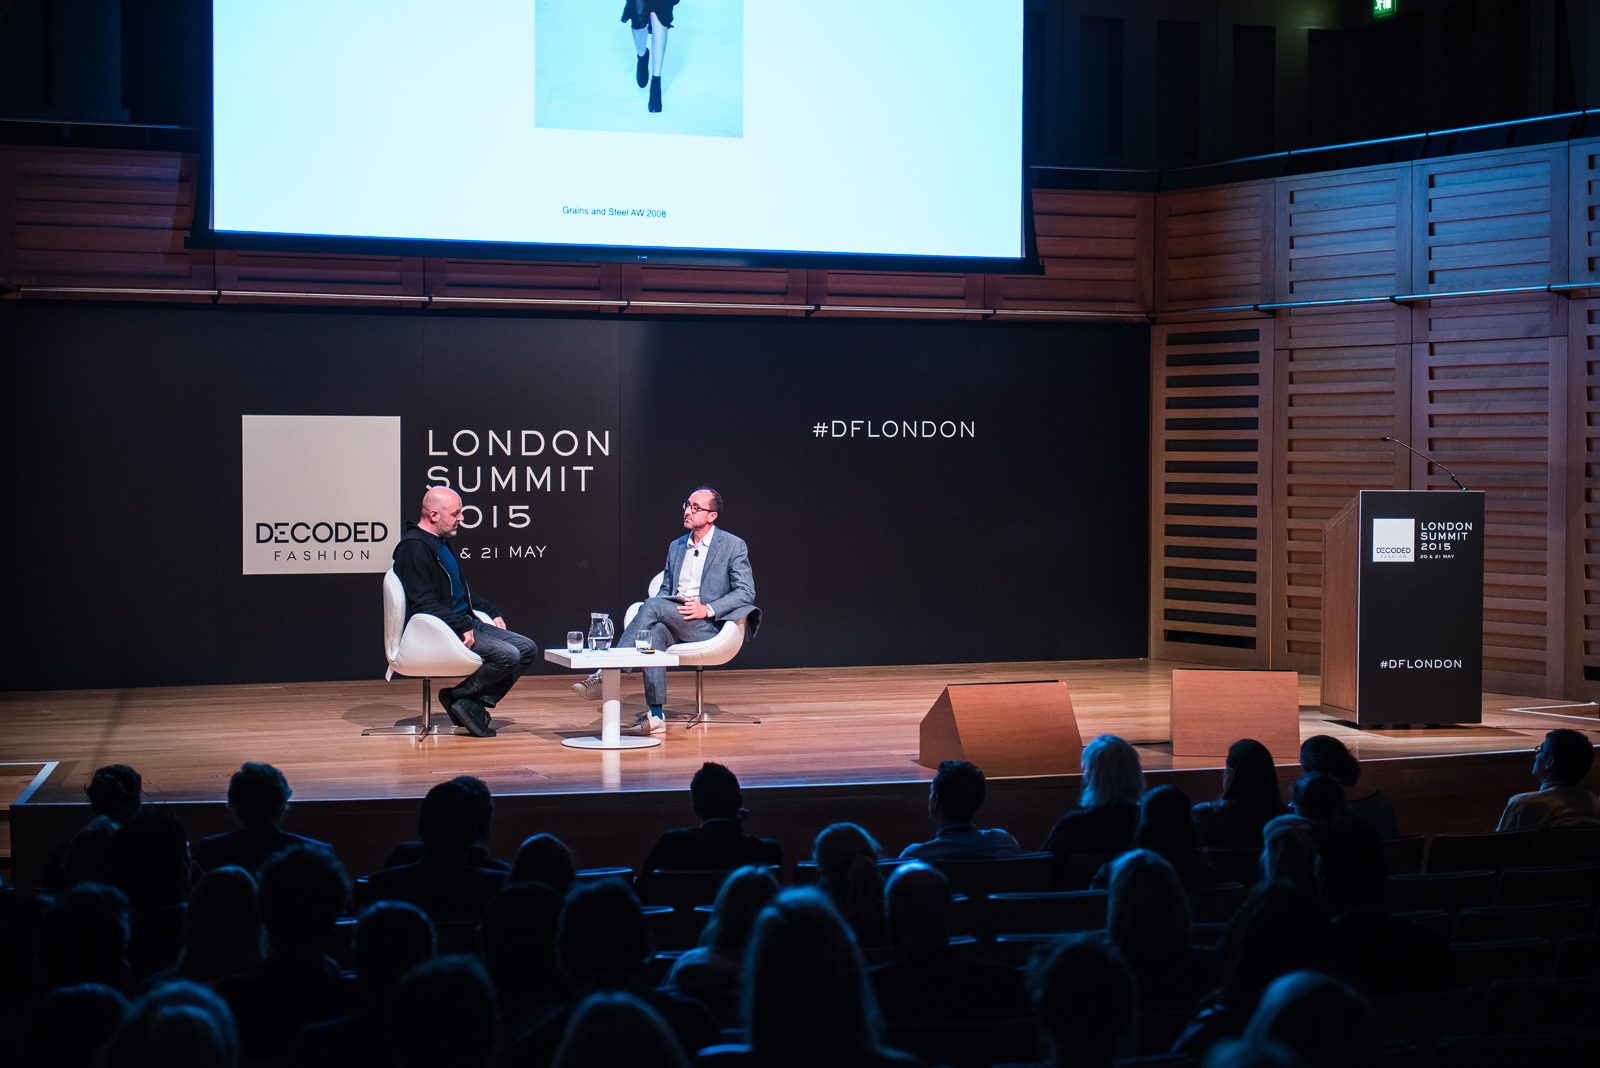 Decoded Fashion London, 20 May 2015, London, UK. Image ©Dan Taylor/Heisenberg Media - http://www.heisenbergmedia.com/